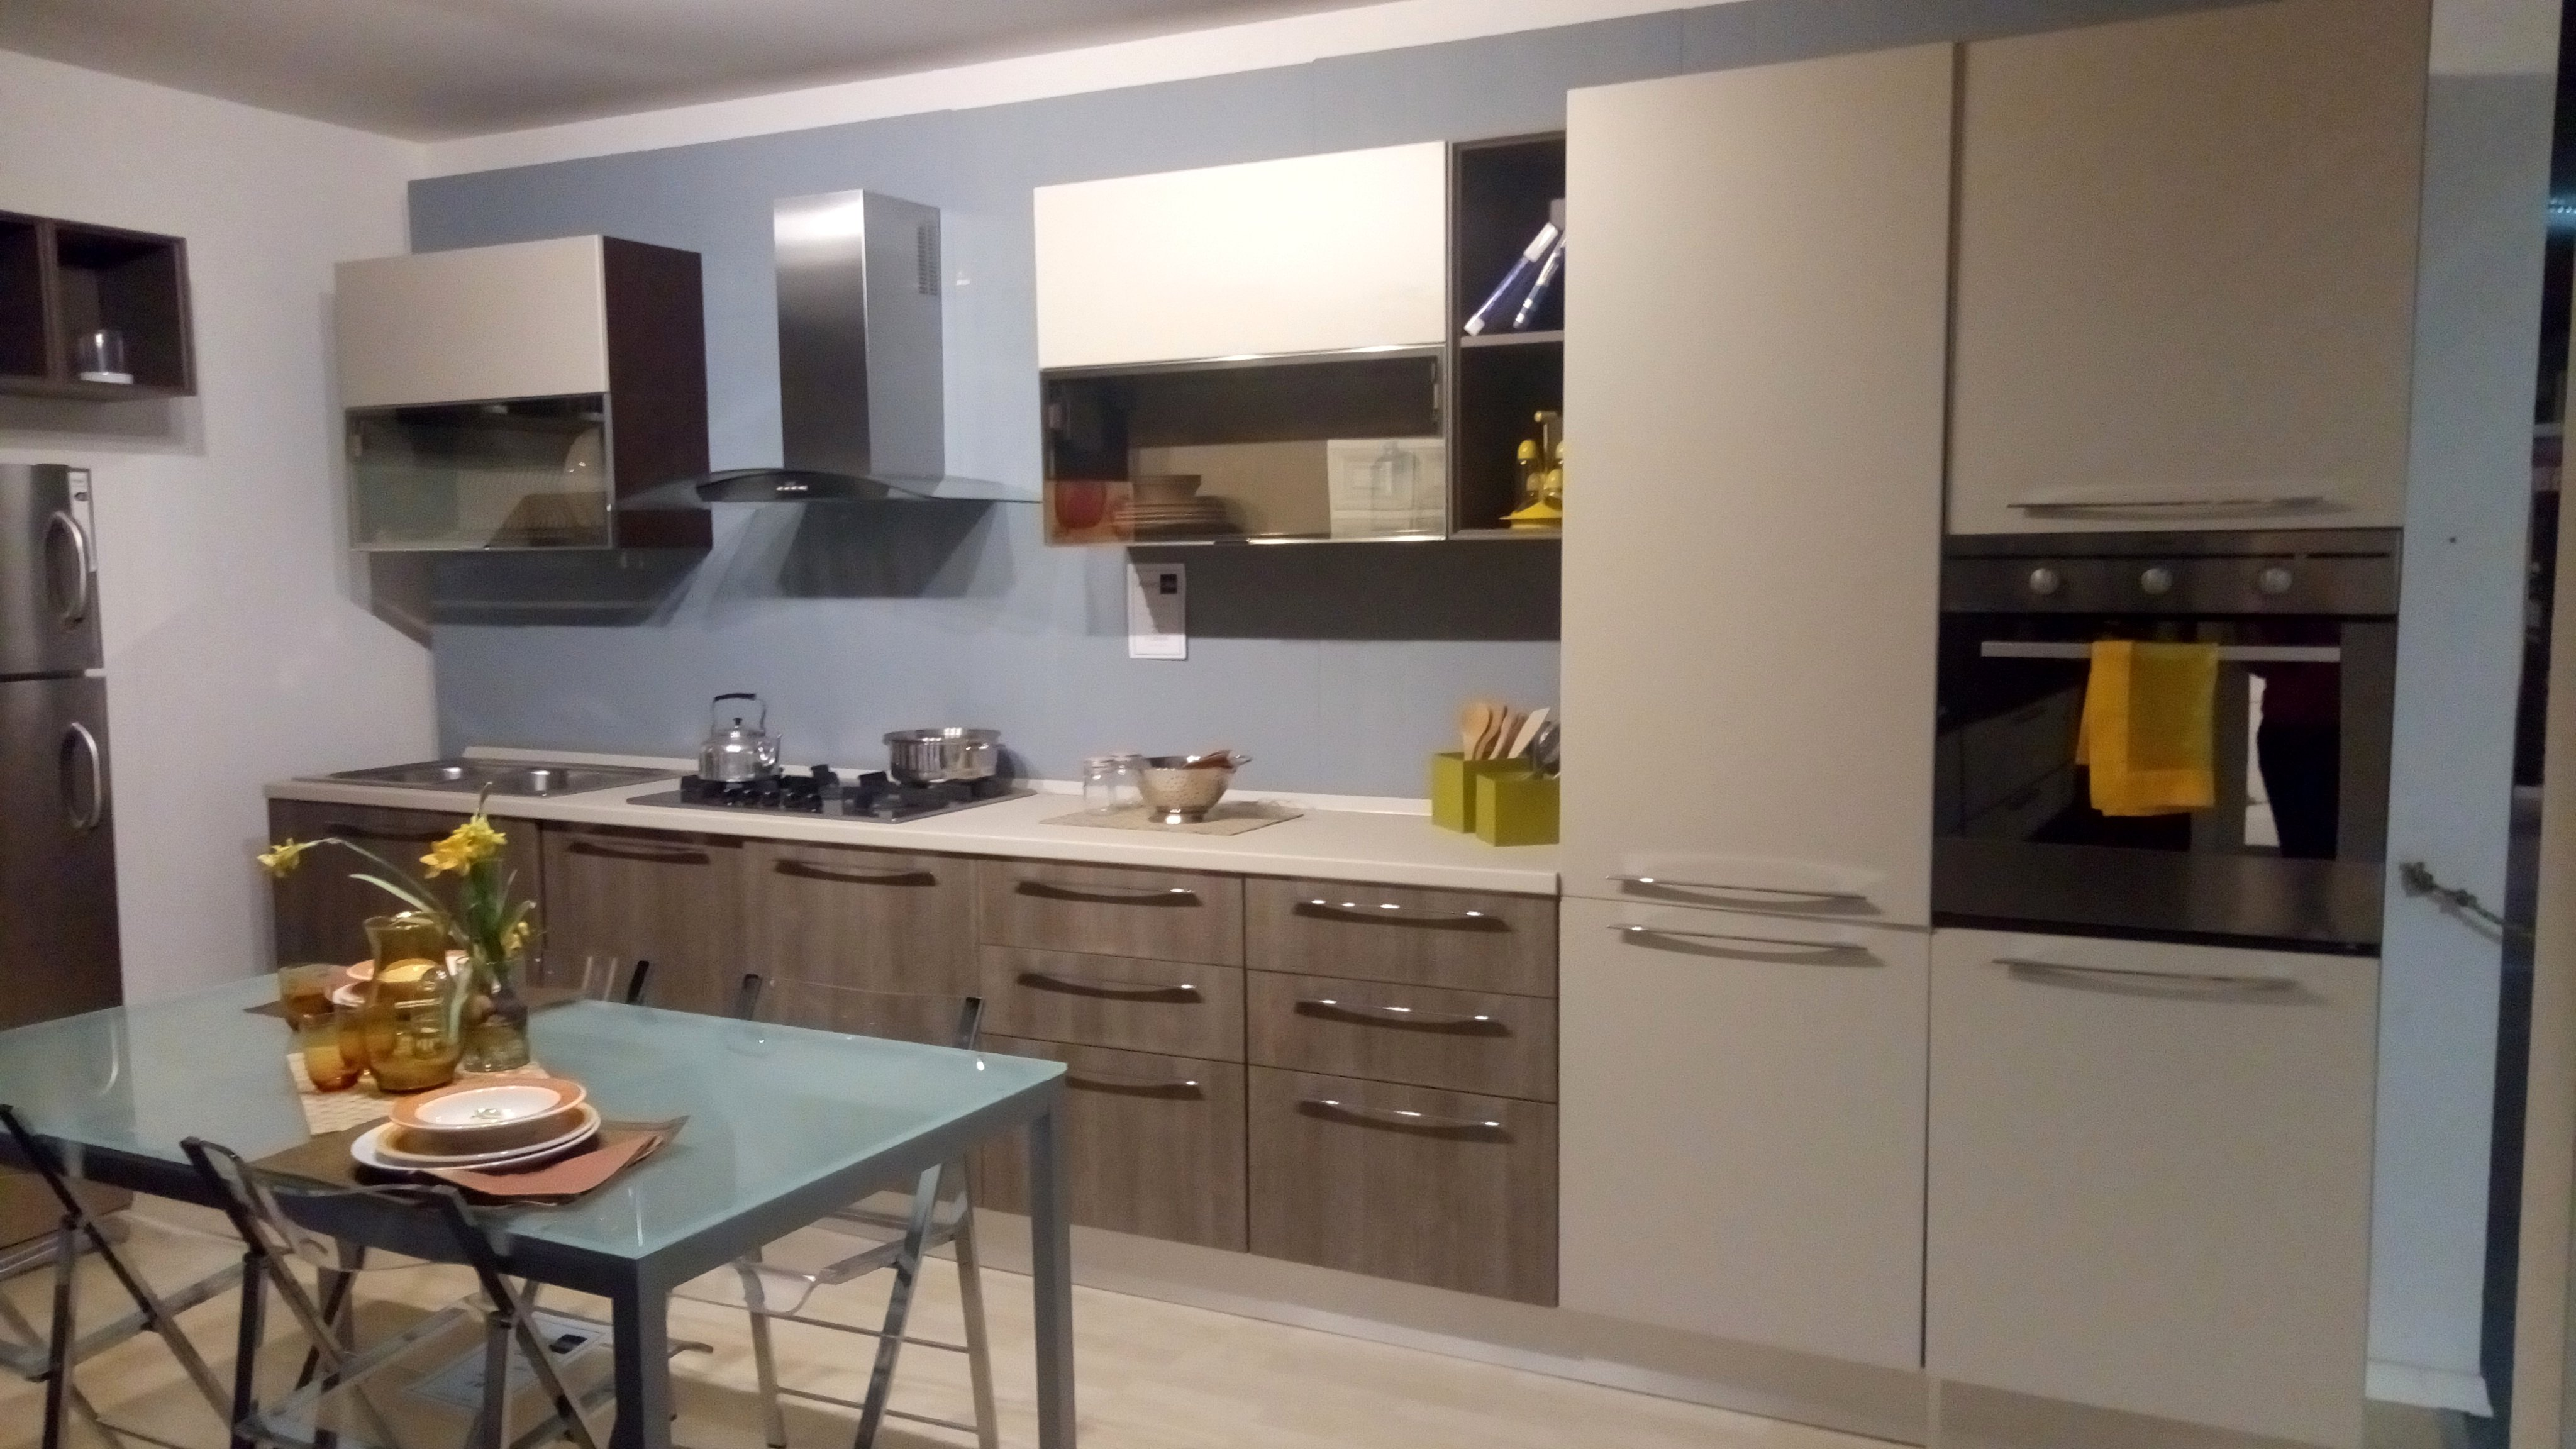 Cucina Lube Noemi CordaRovere - Vissani Casa